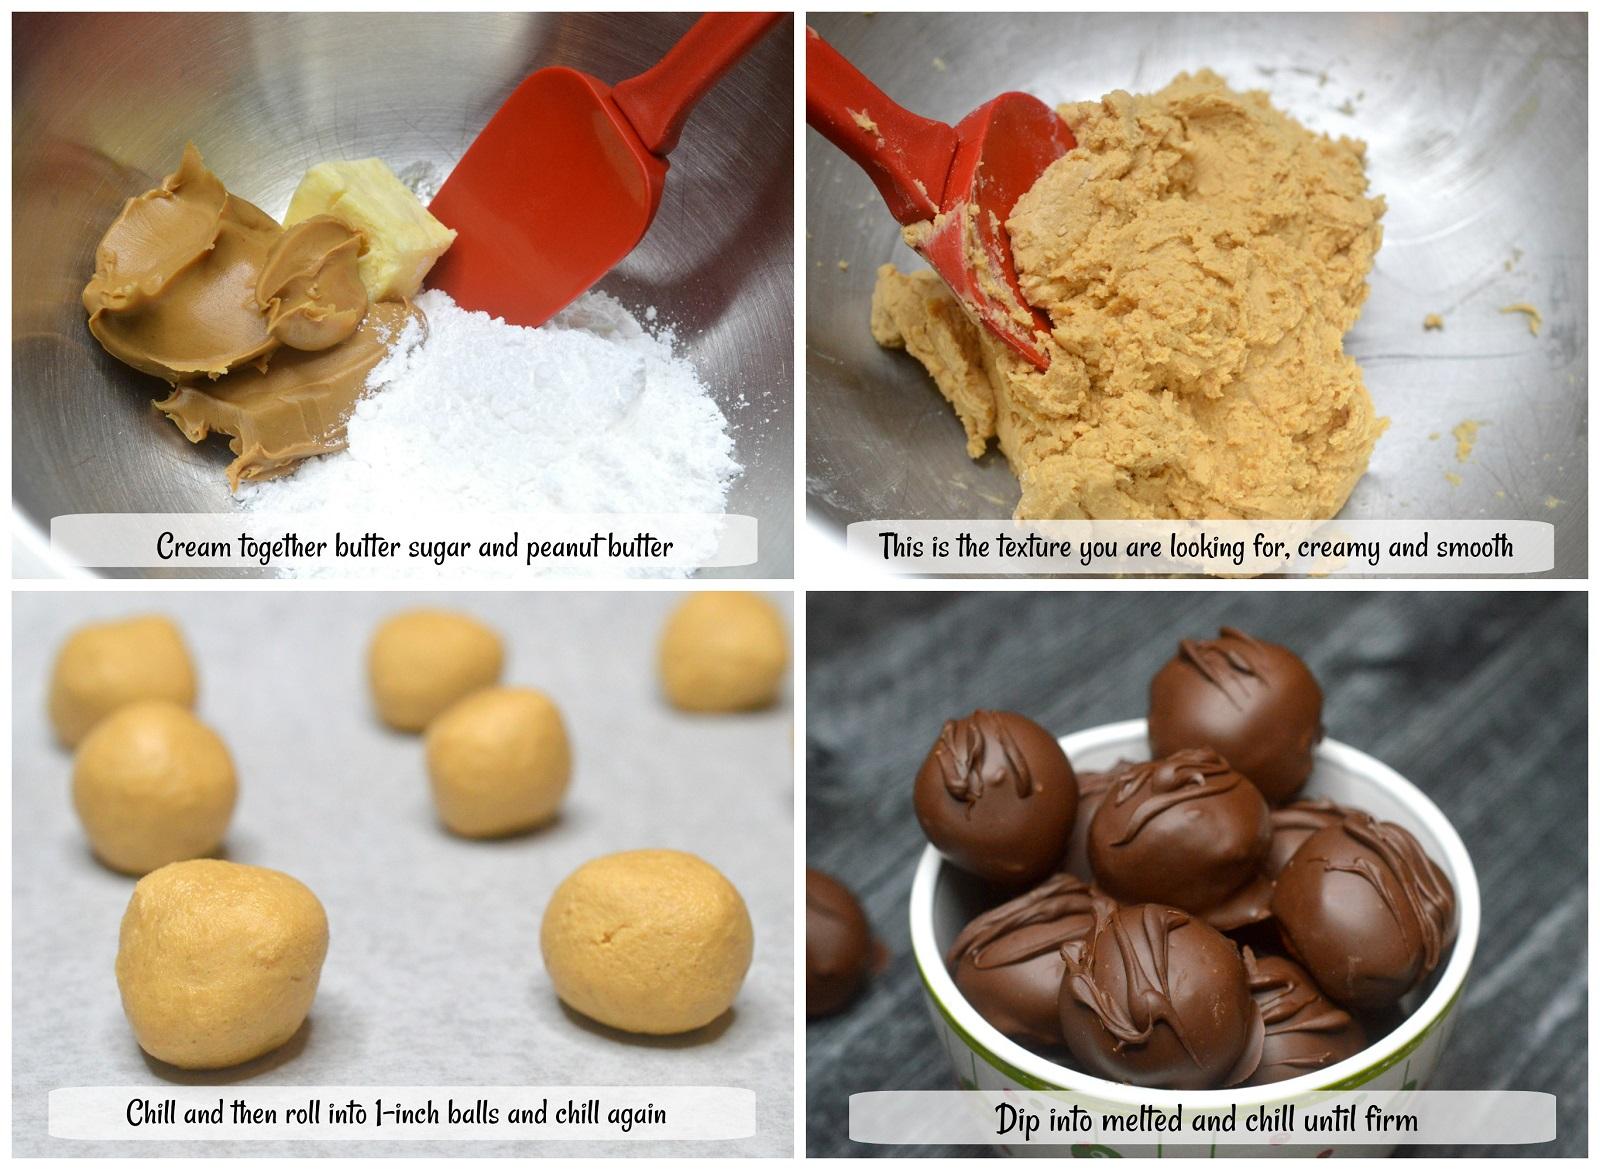 How To Make Homemade Chocolate Peanut Butter Balls